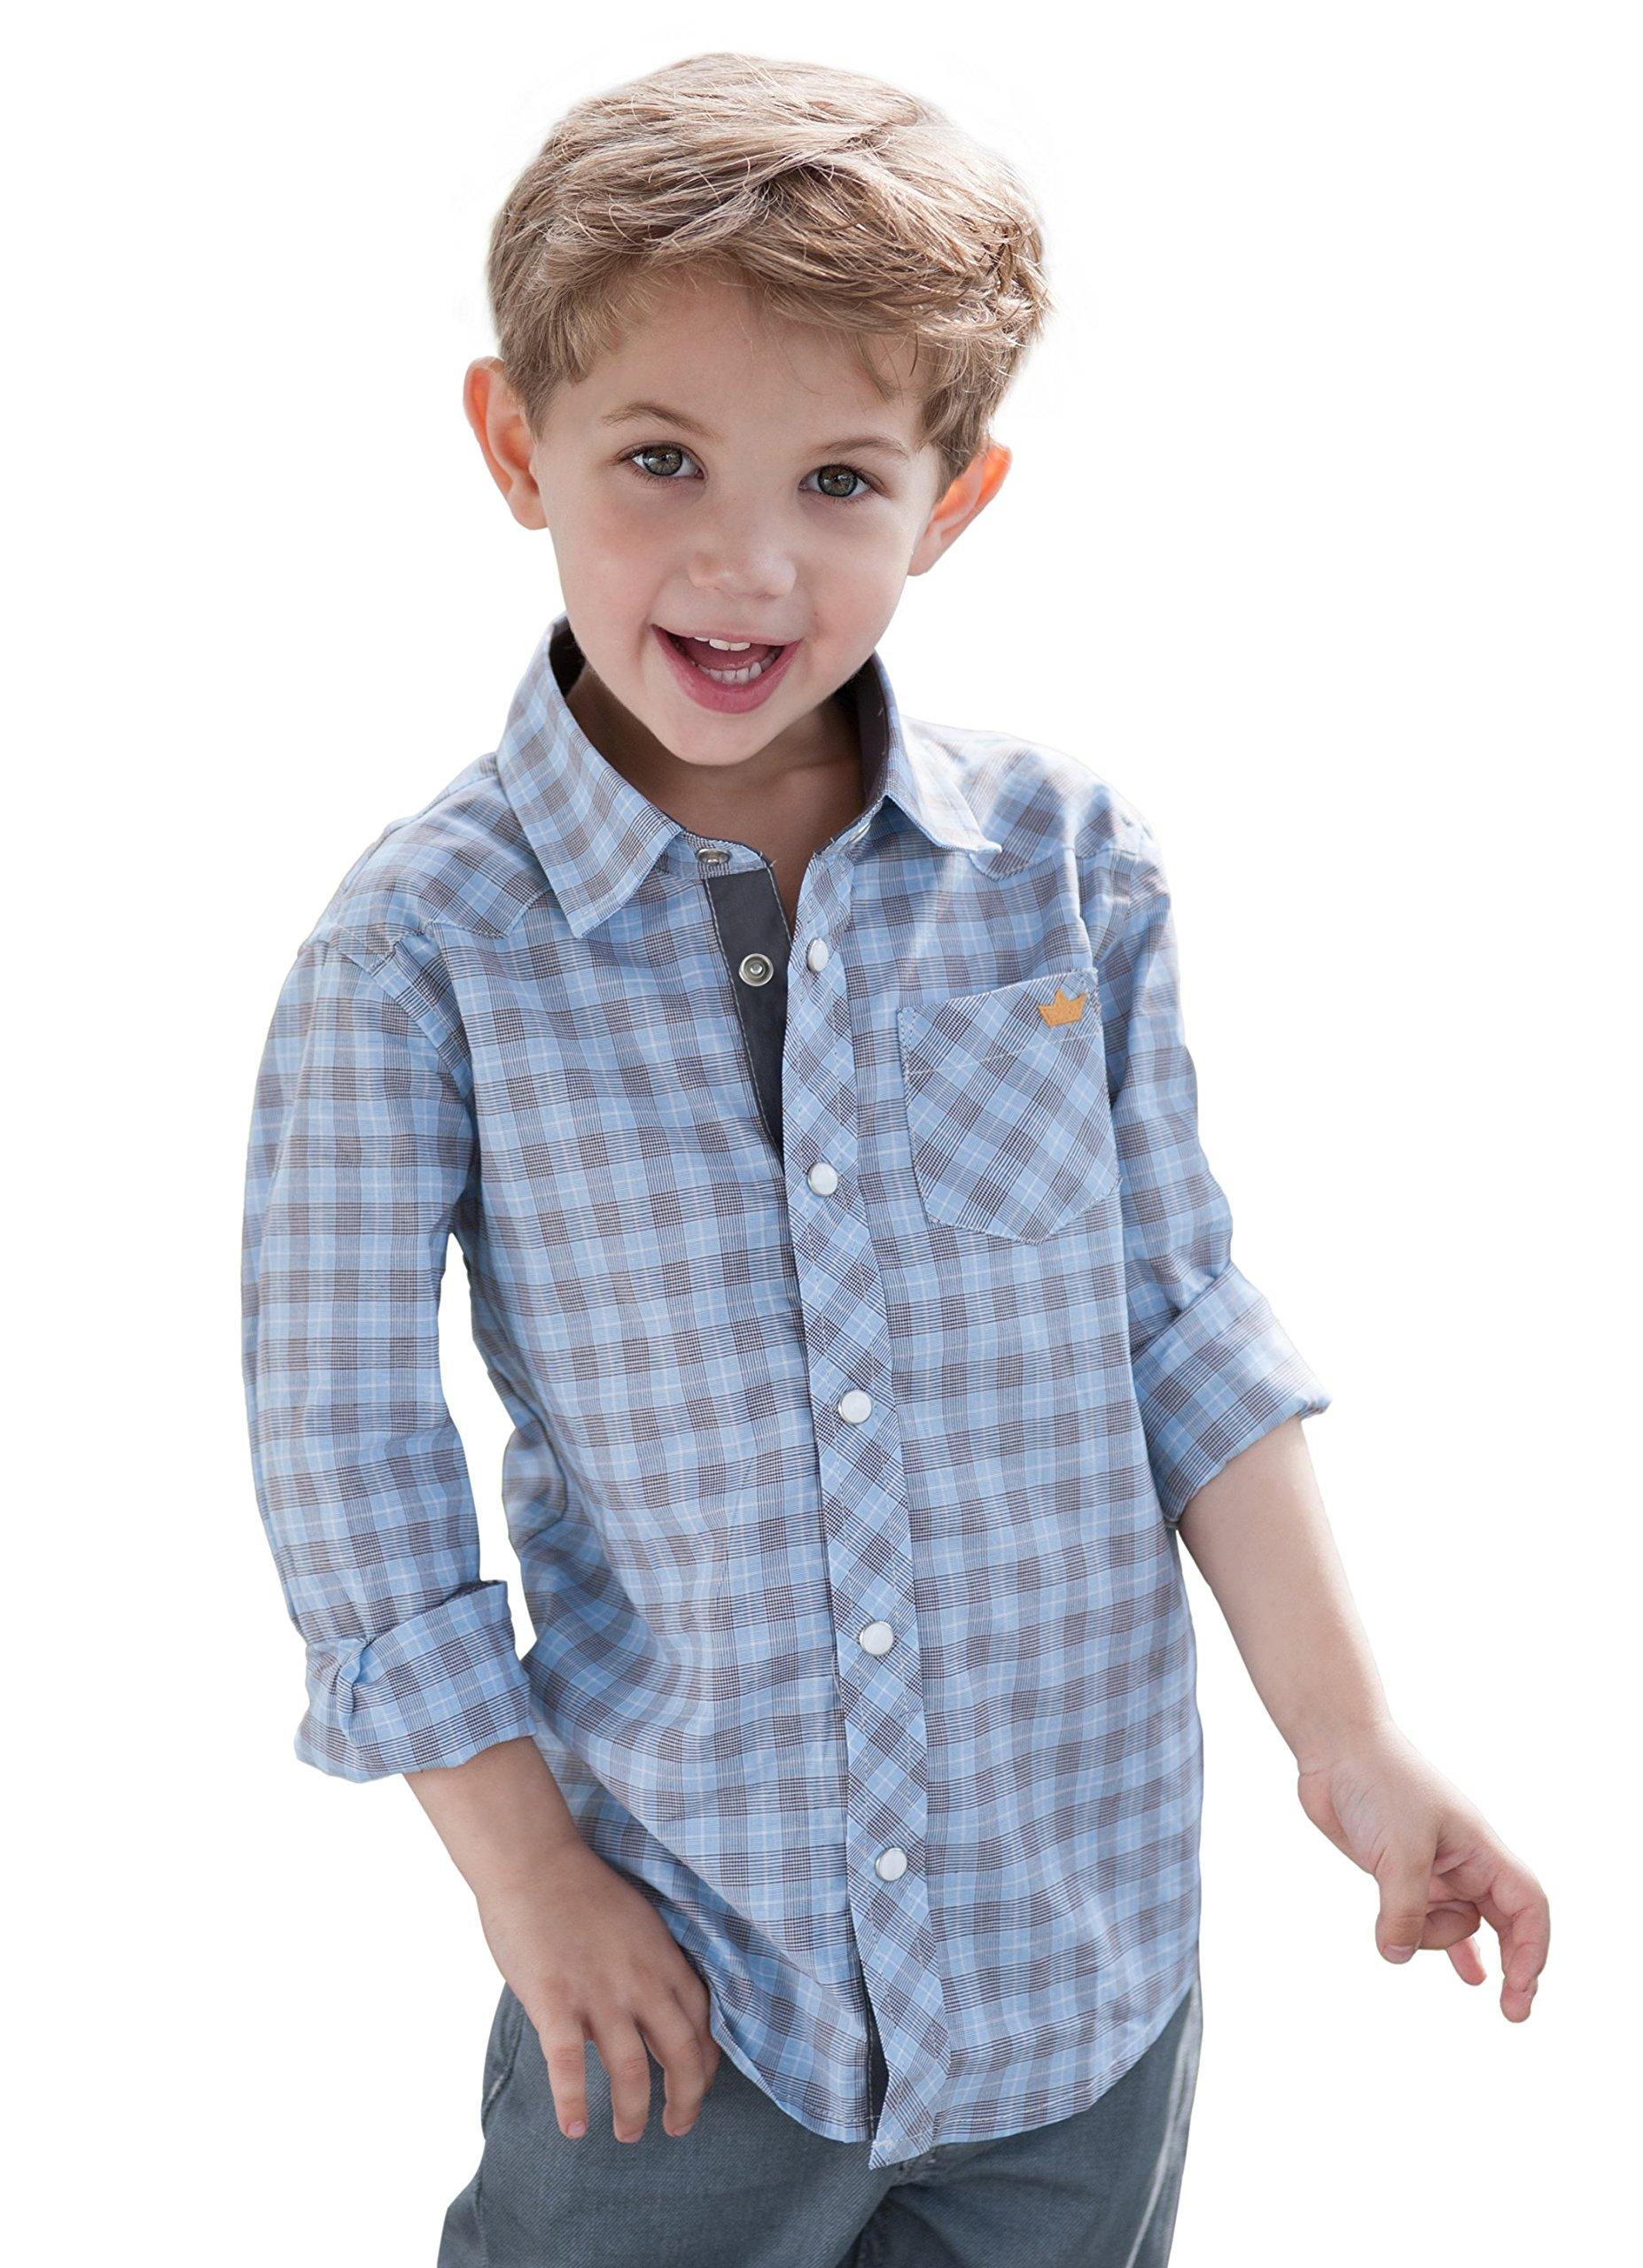 Dakomoda Toddler Boy's Cotton Blue Check Western Plaid Snap Shirt 3T